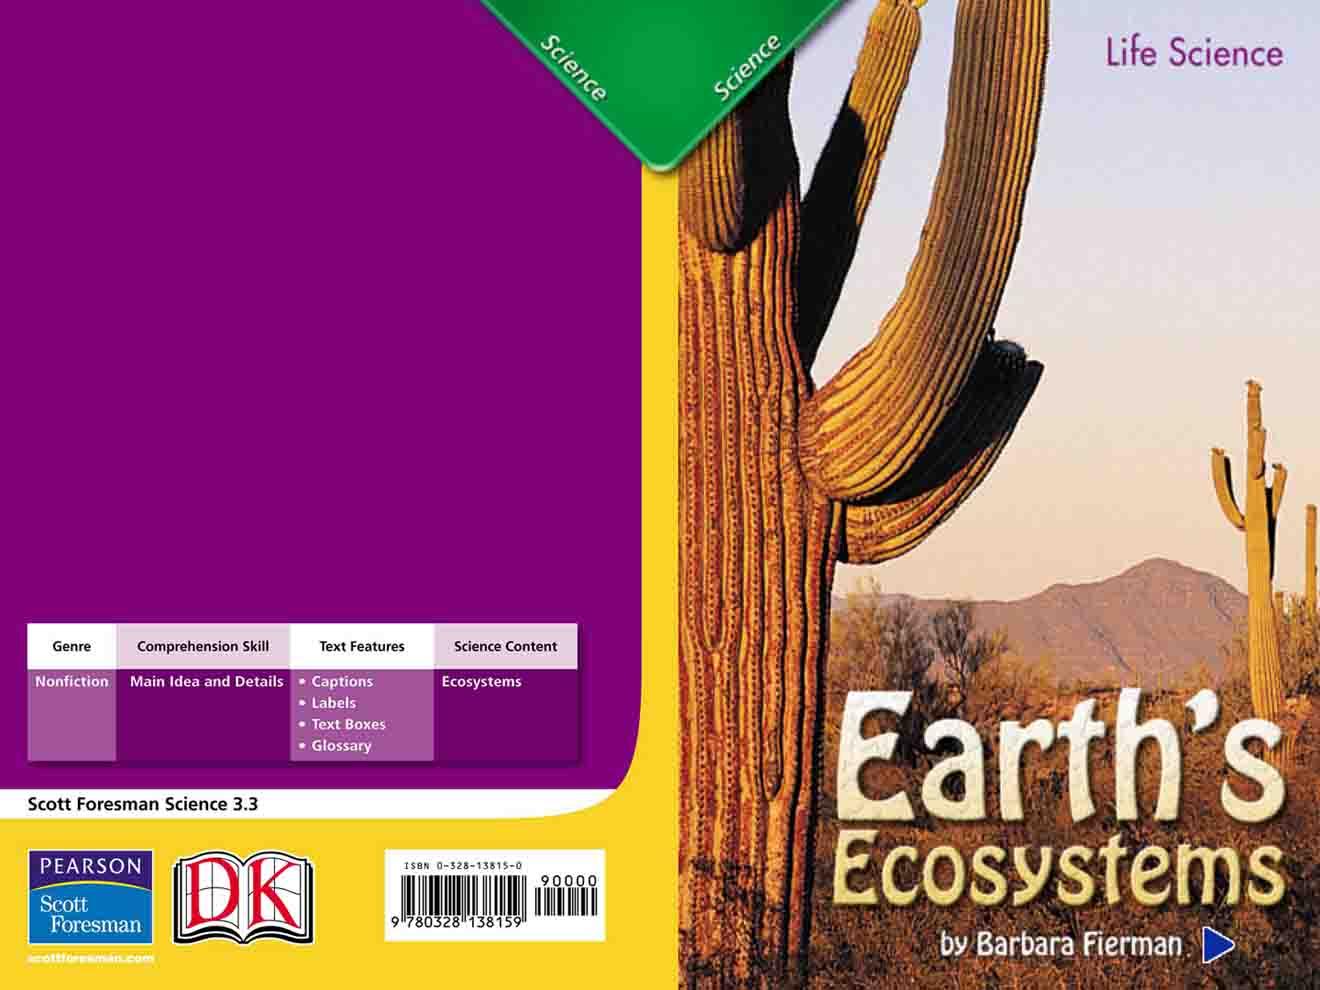 http://uupload.ir/files/18px_earths_ecosystems_(m)-1.jpg